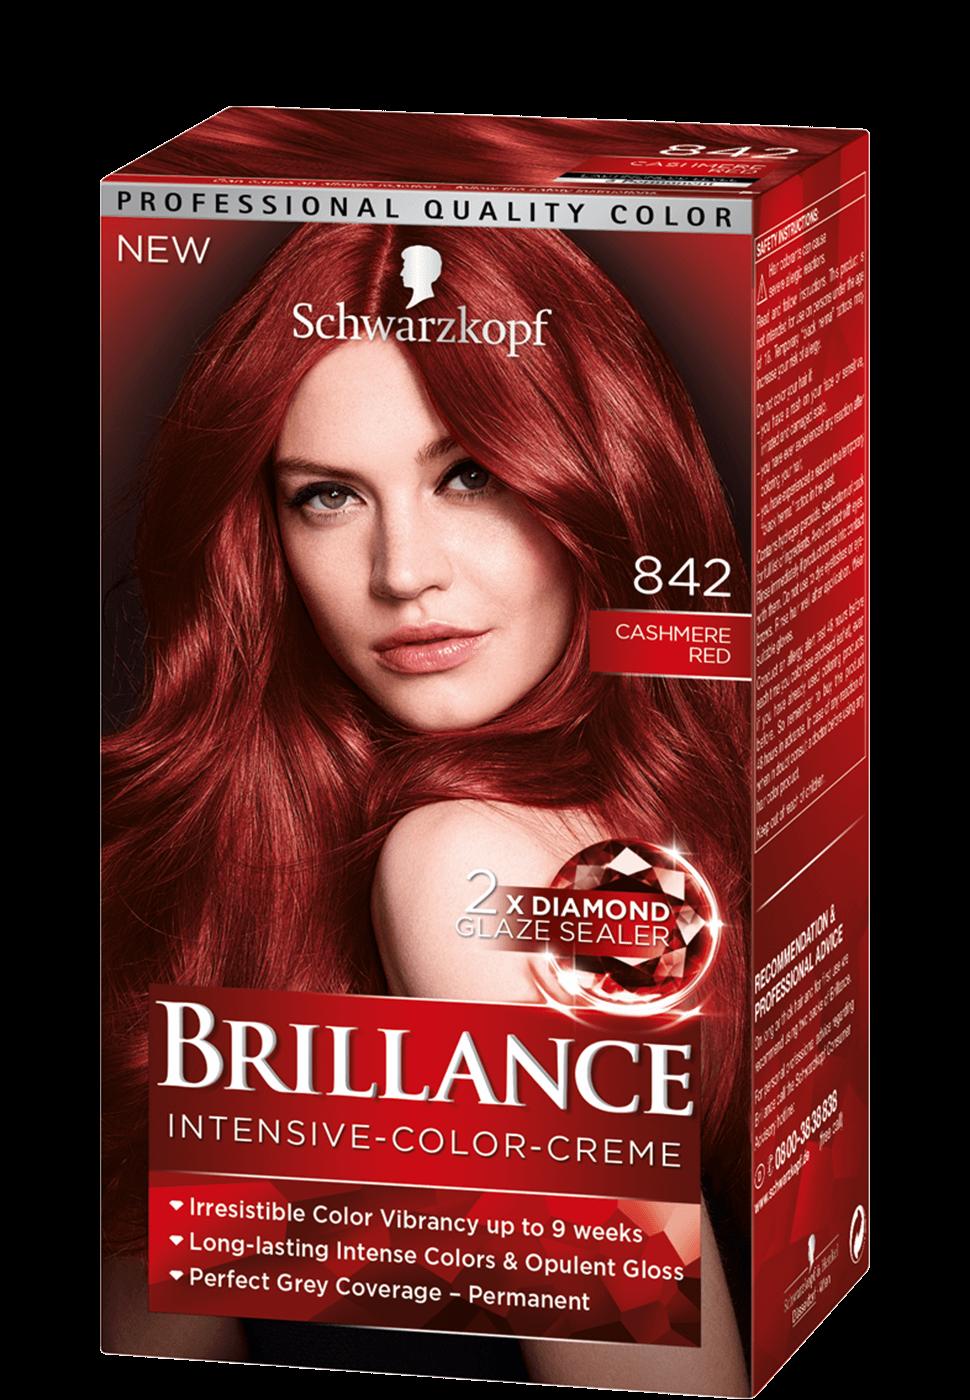 Brillance_com_intensive_color_